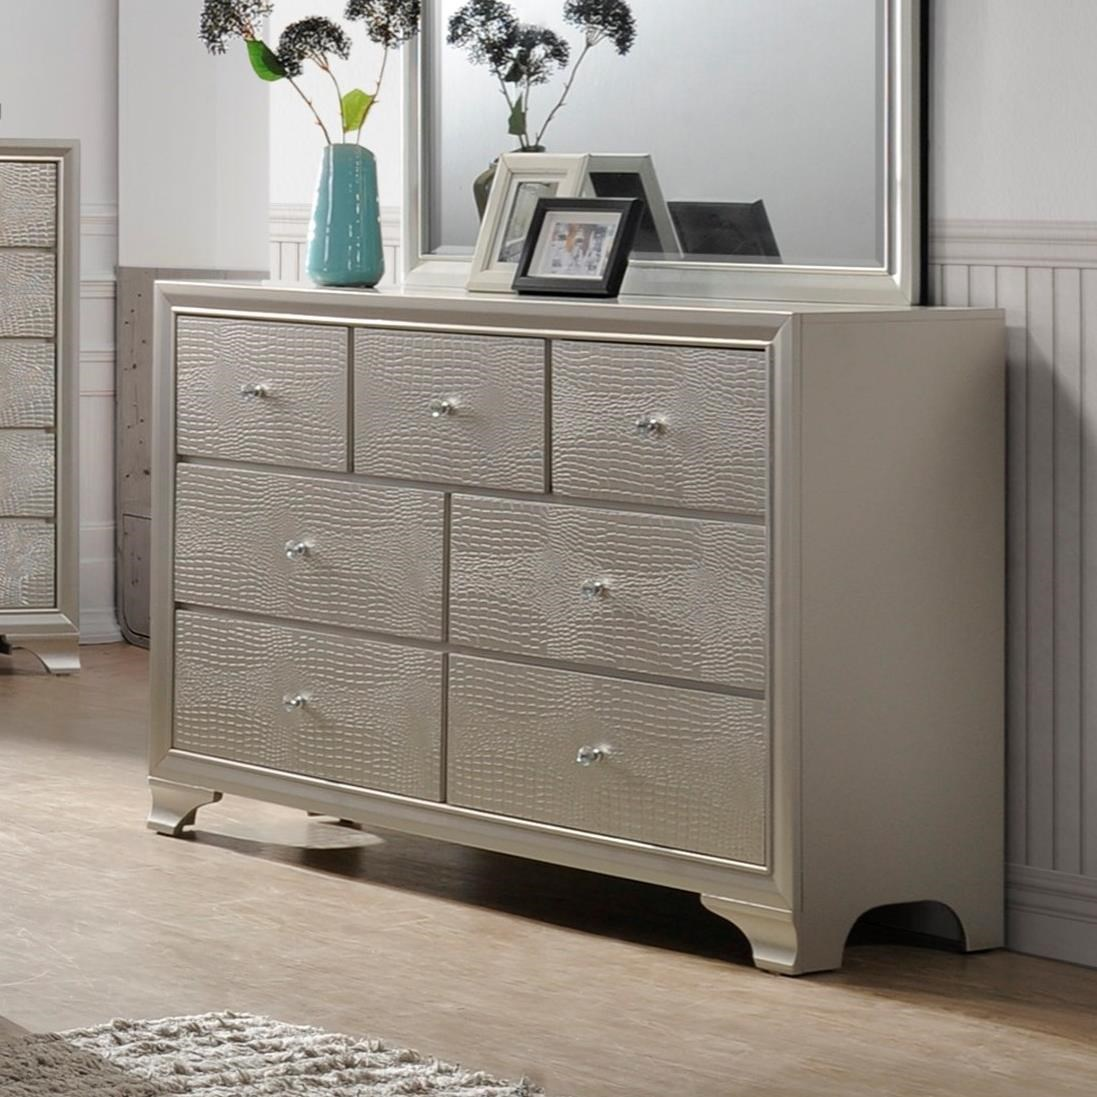 Lyssa Dresser by Crown Mark at Northeast Factory Direct